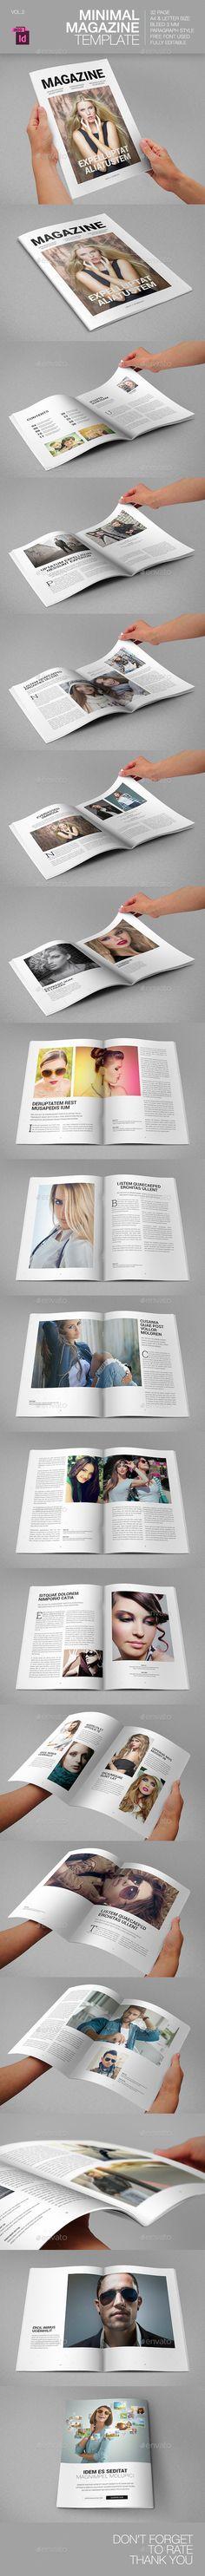 Minimal Magazine Template — InDesign INDD #fashion #style magazine • Available here → https://graphicriver.net/item/minimal-magazine-template/9228003?ref=pxcr